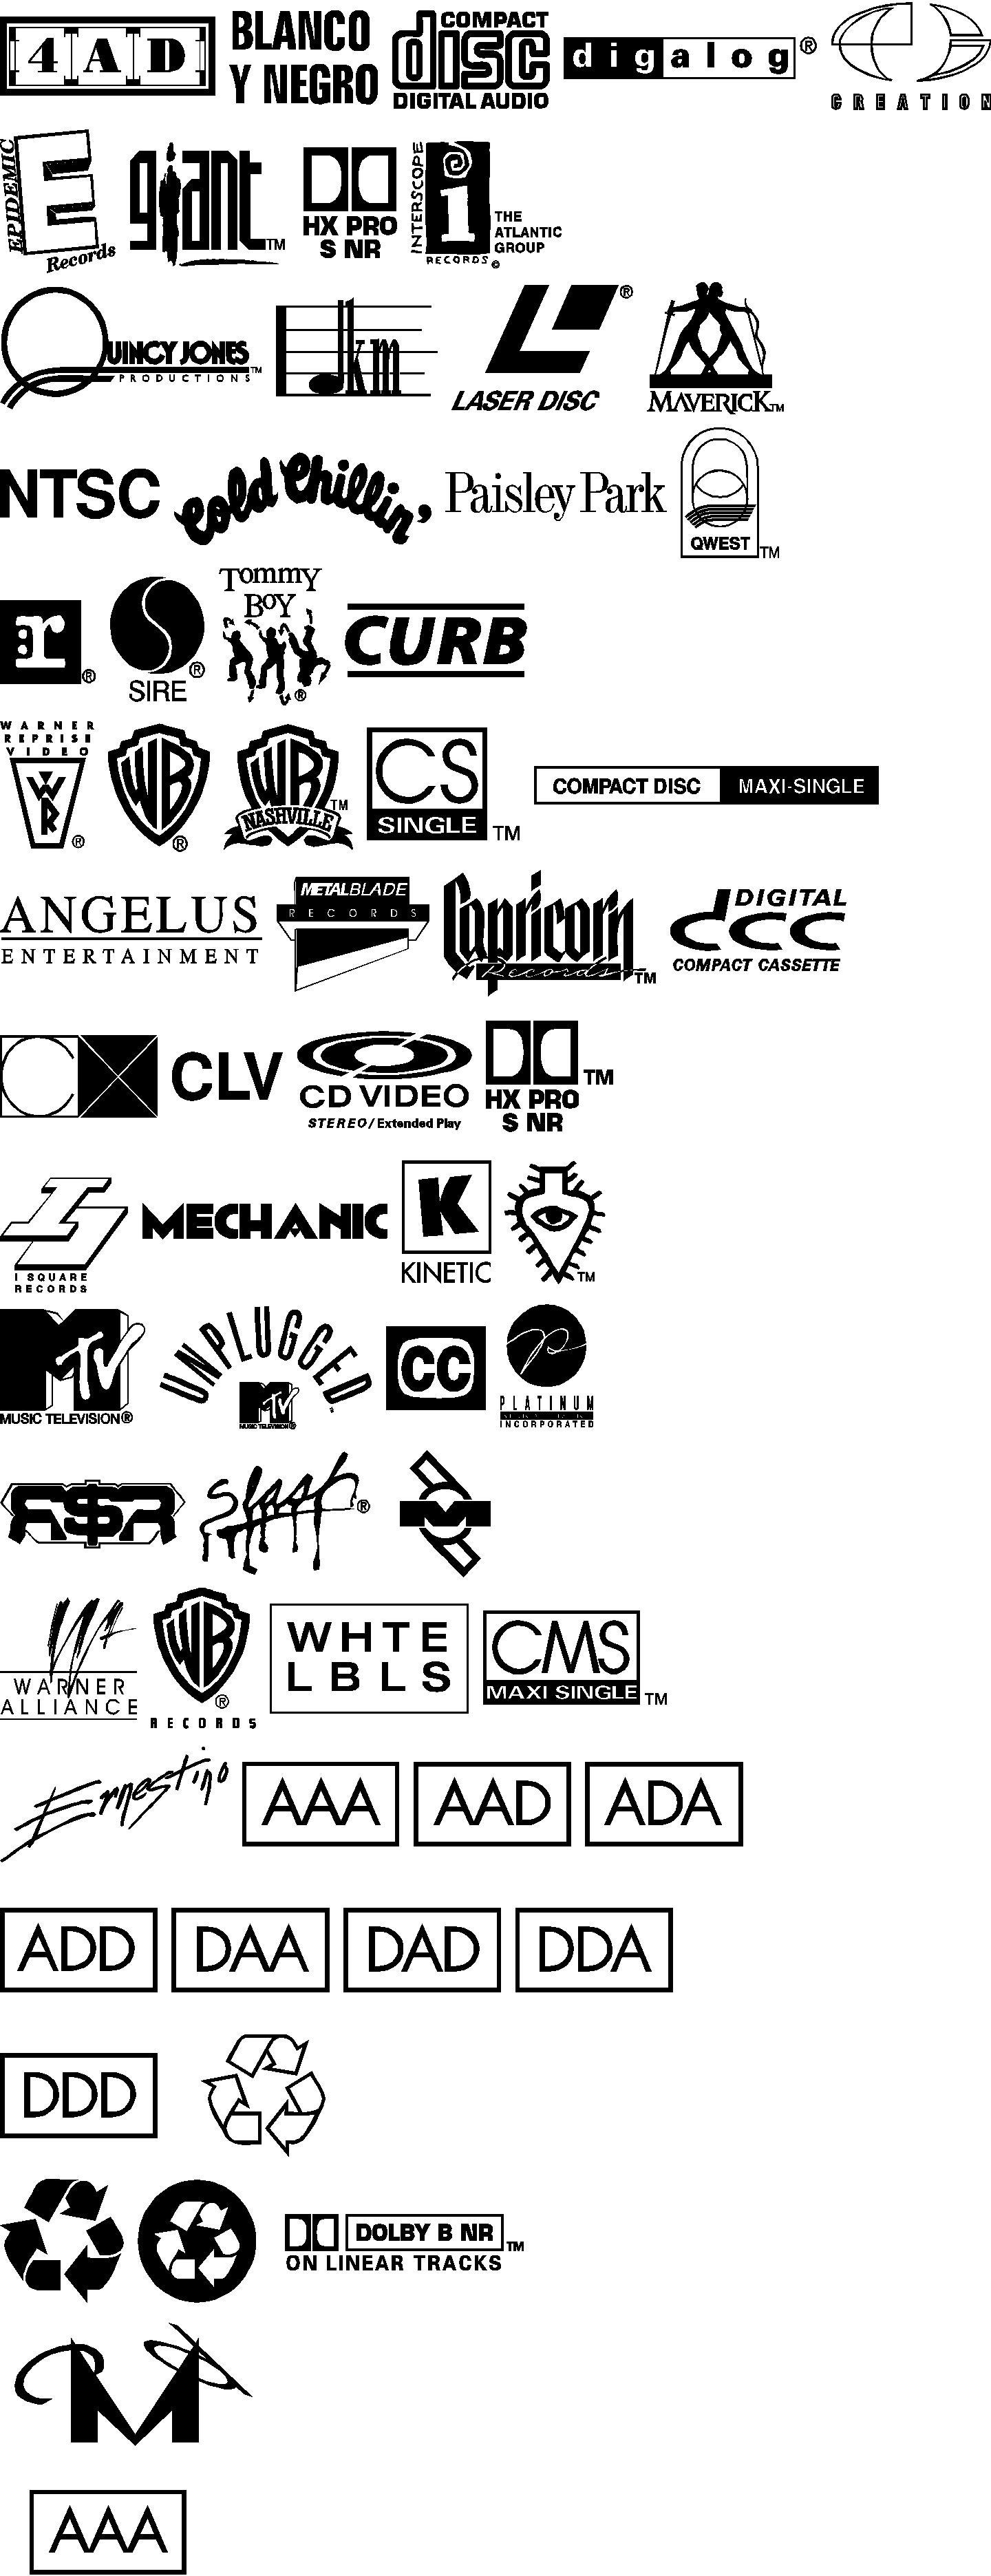 www logos international network team